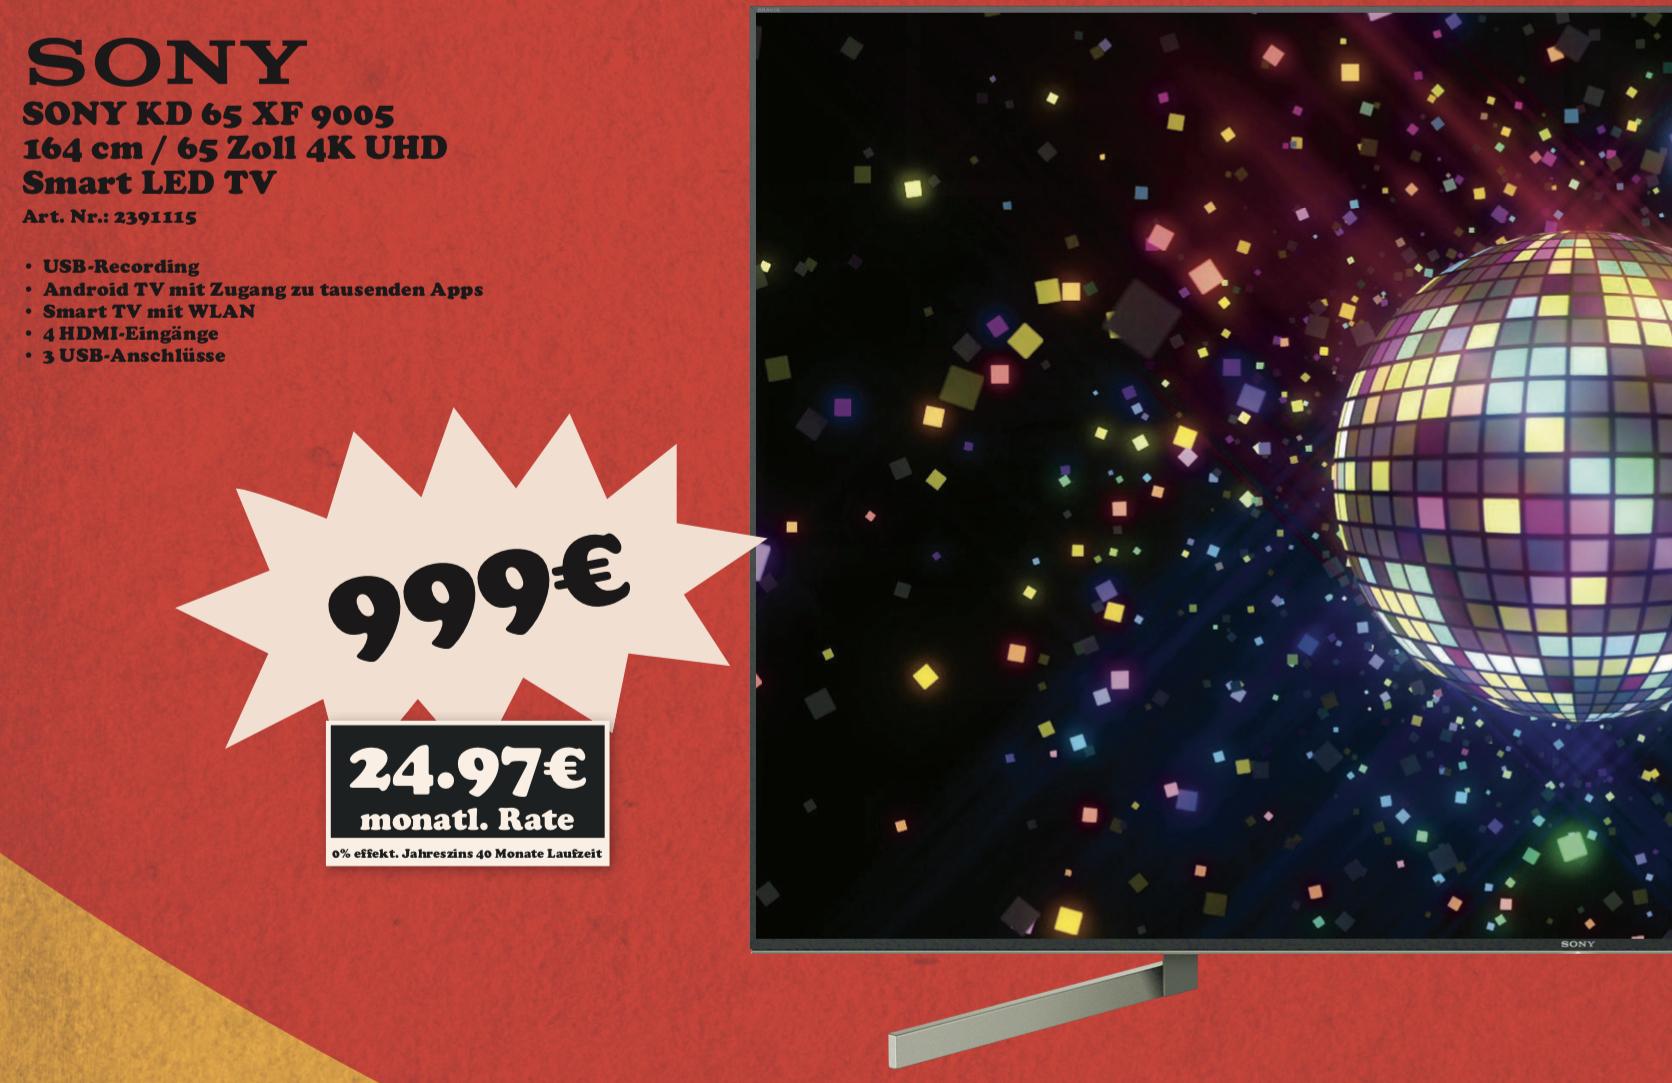 Lokal Mediamarkt München: Sony KD-65XF9005 164cm 4K UHD TV FALD für 999€